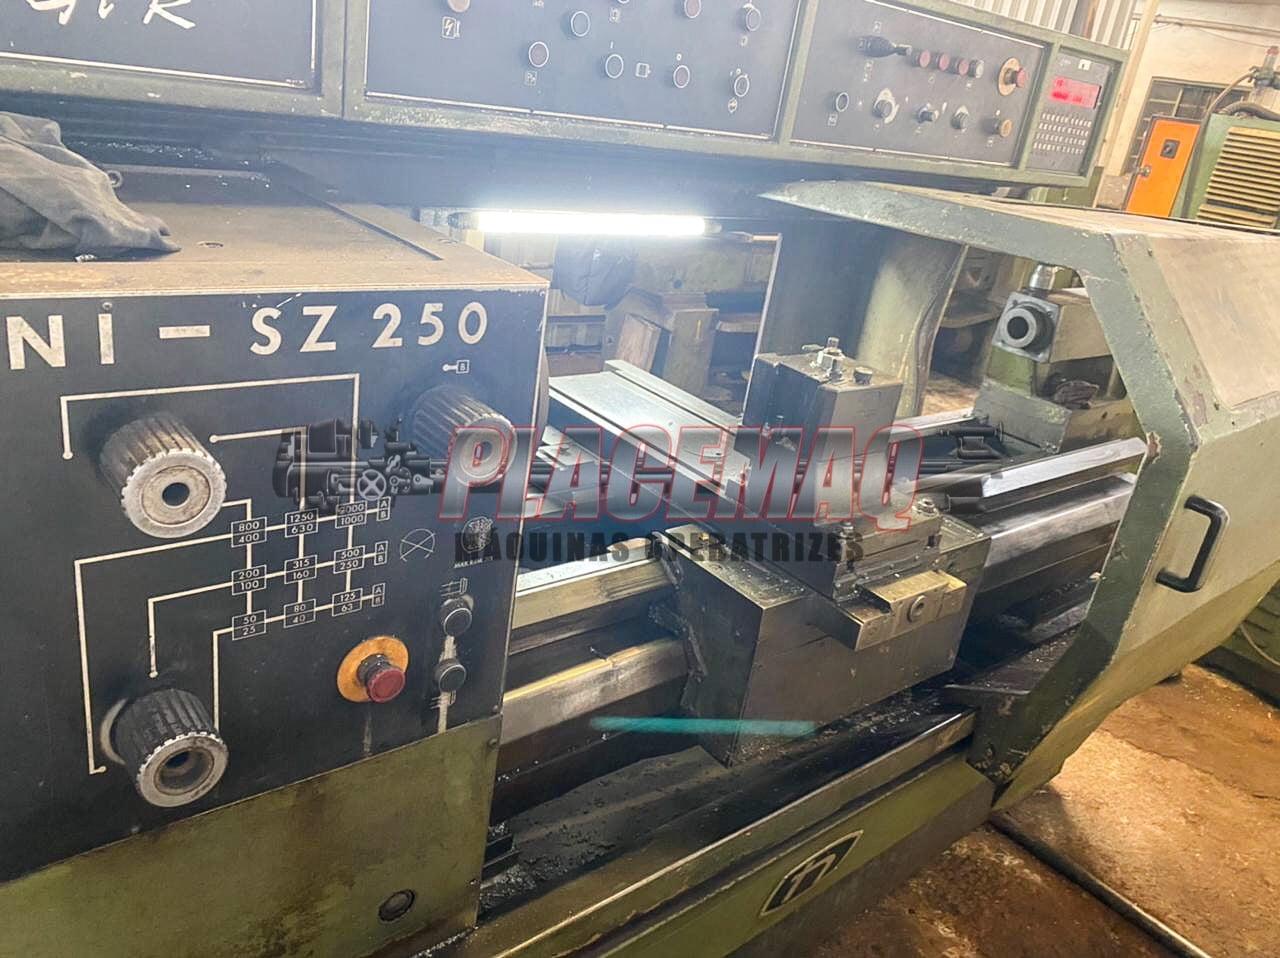 TORNO CNC NARDINI SAGAZ MOD. GPR SZ 250 / TORNO CNC NARDINI NODUS MOD.GPR ND 195E